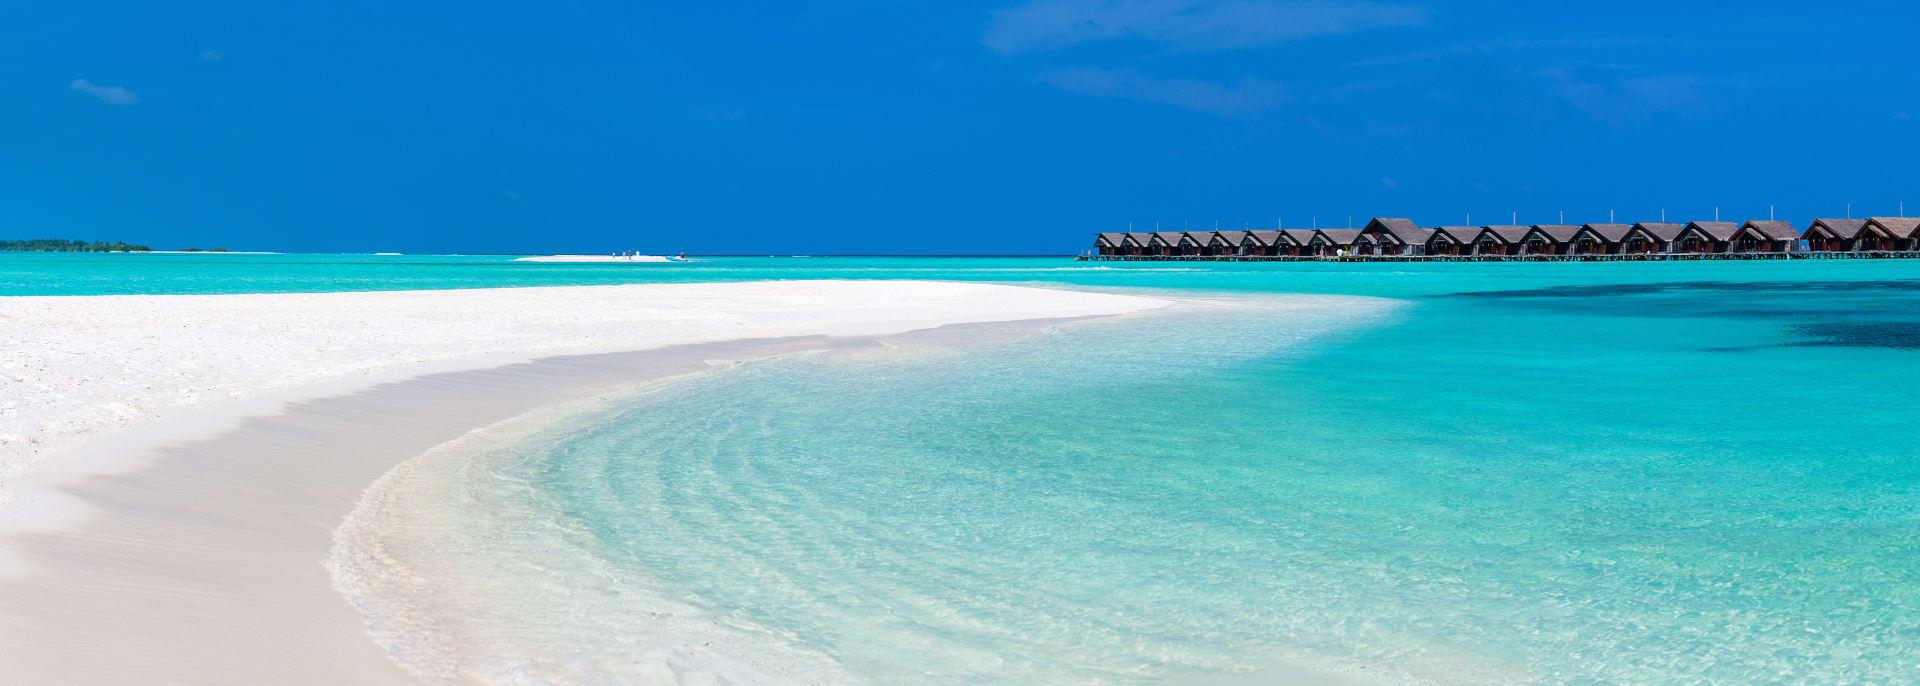 Nord ari Island, Malediven